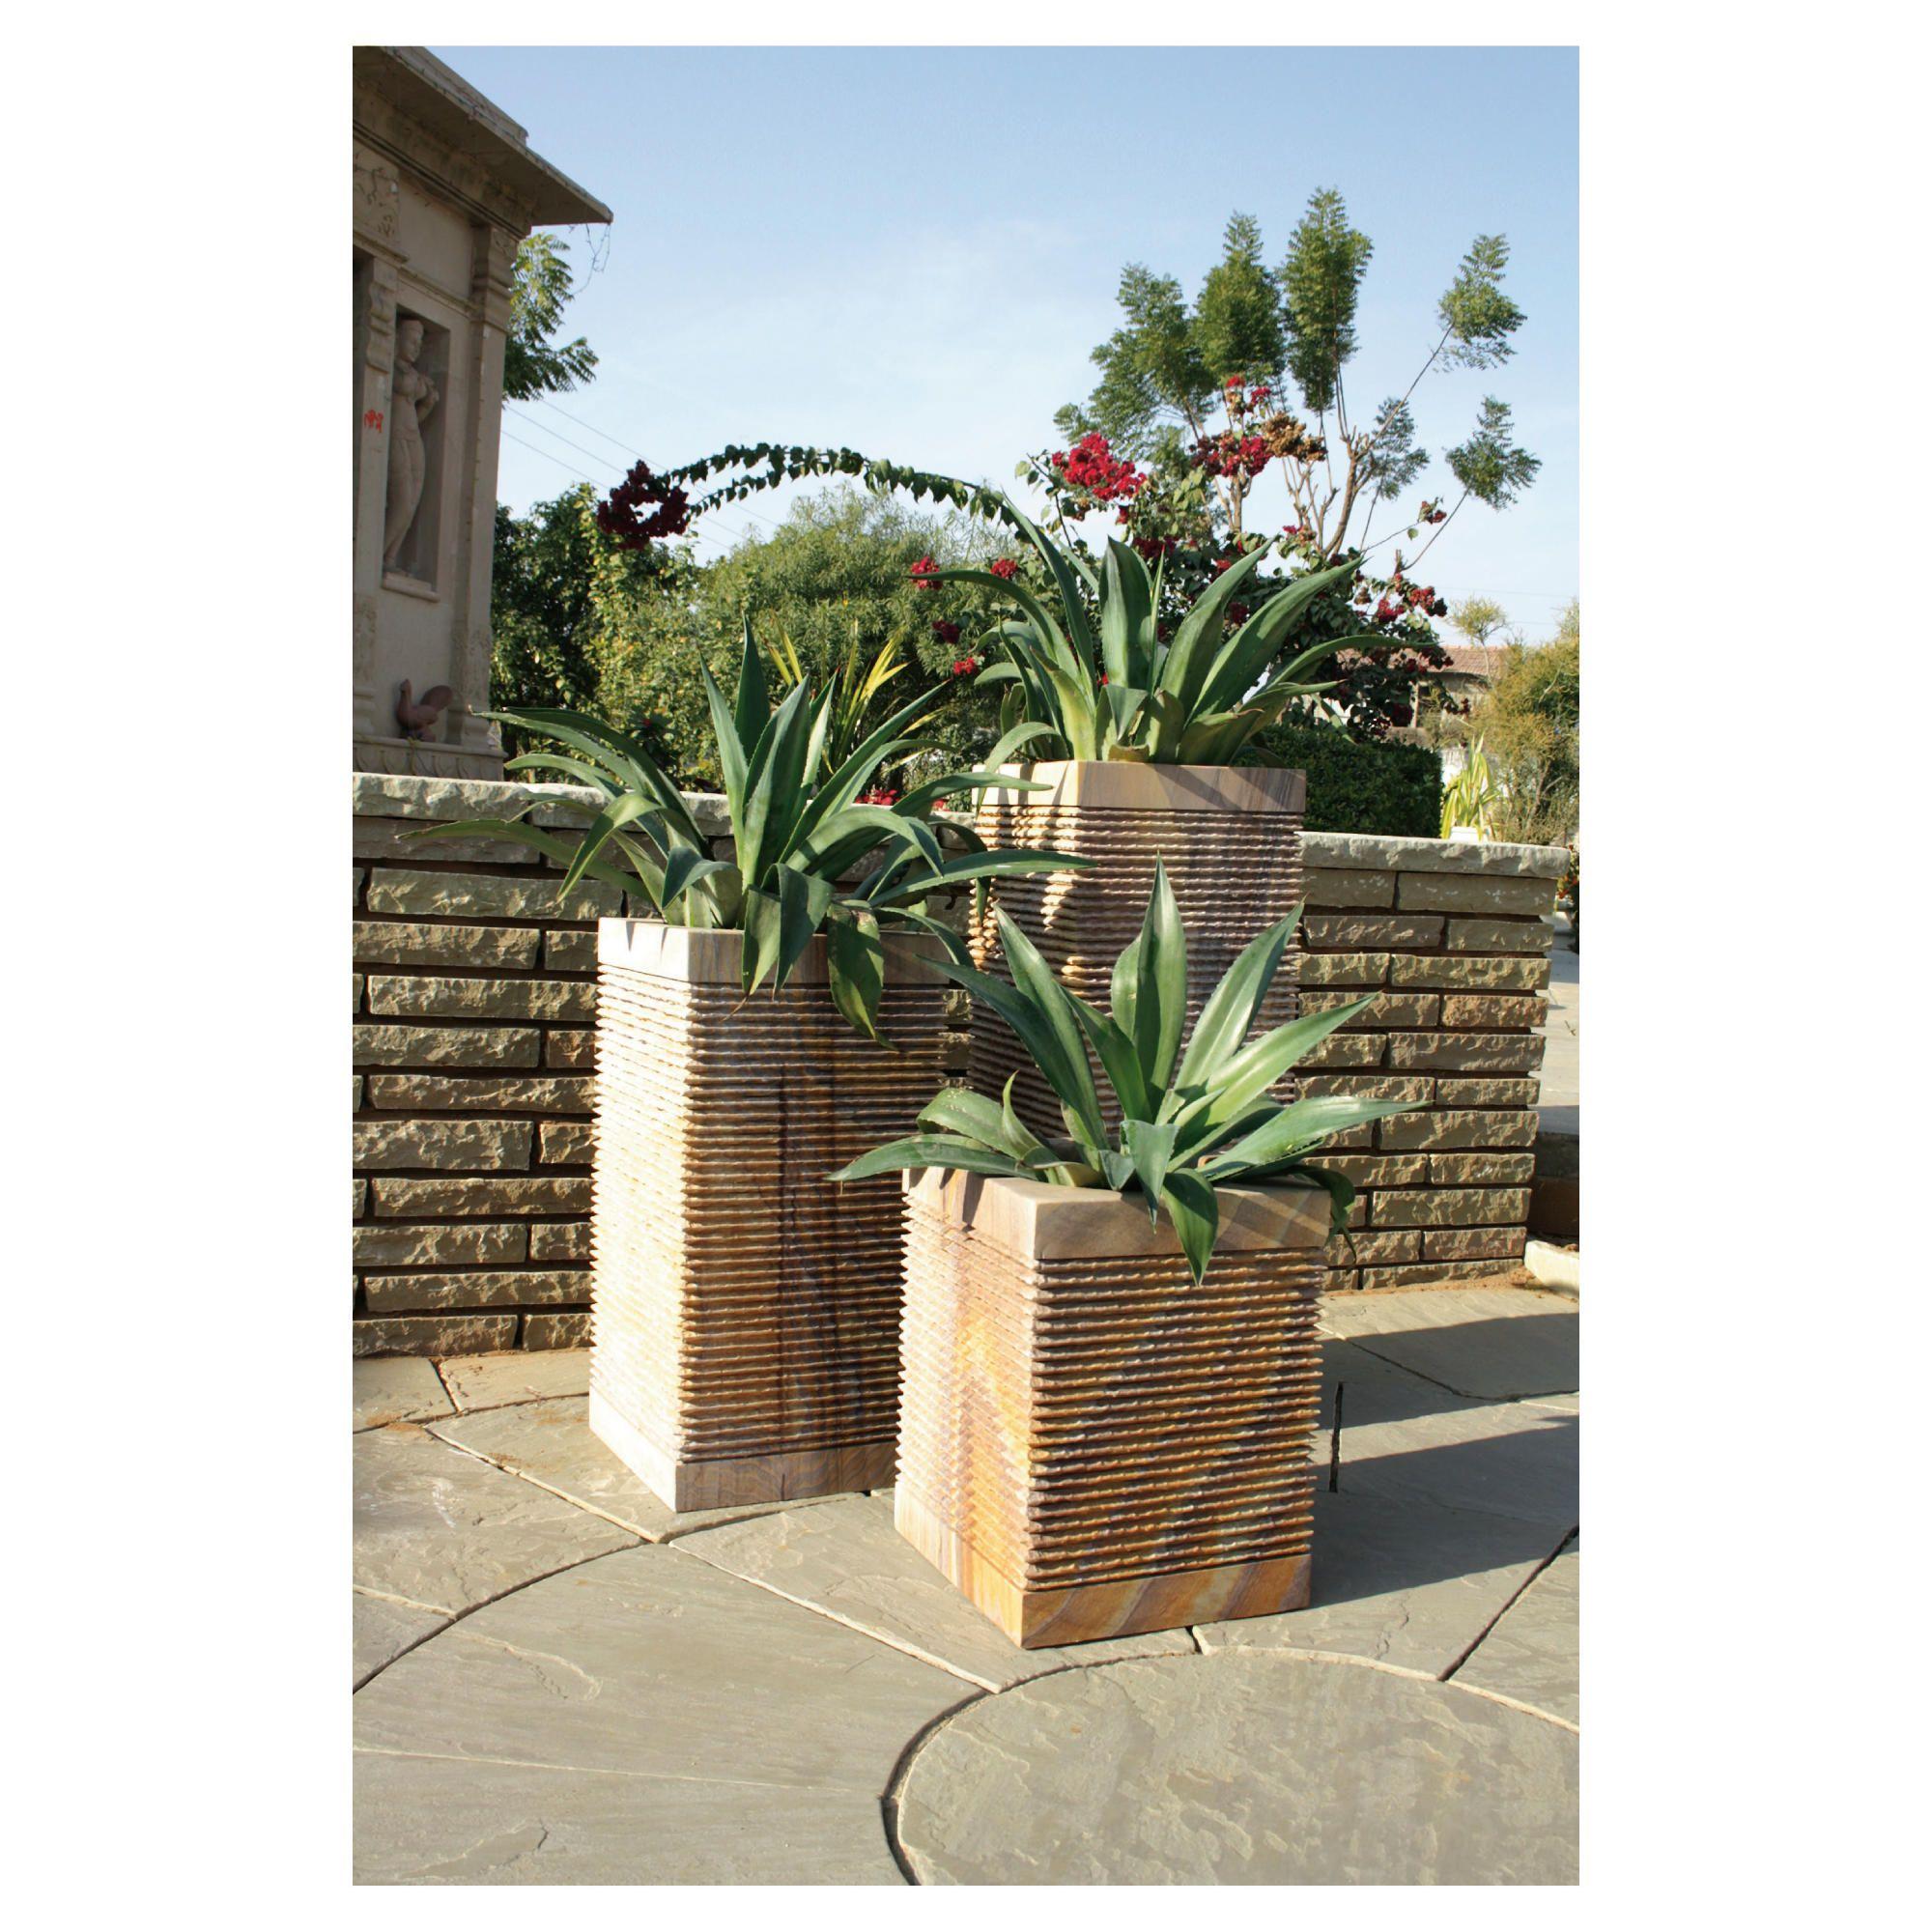 Caelum Rainbow Stone Planter 60cm at Tesco Direct